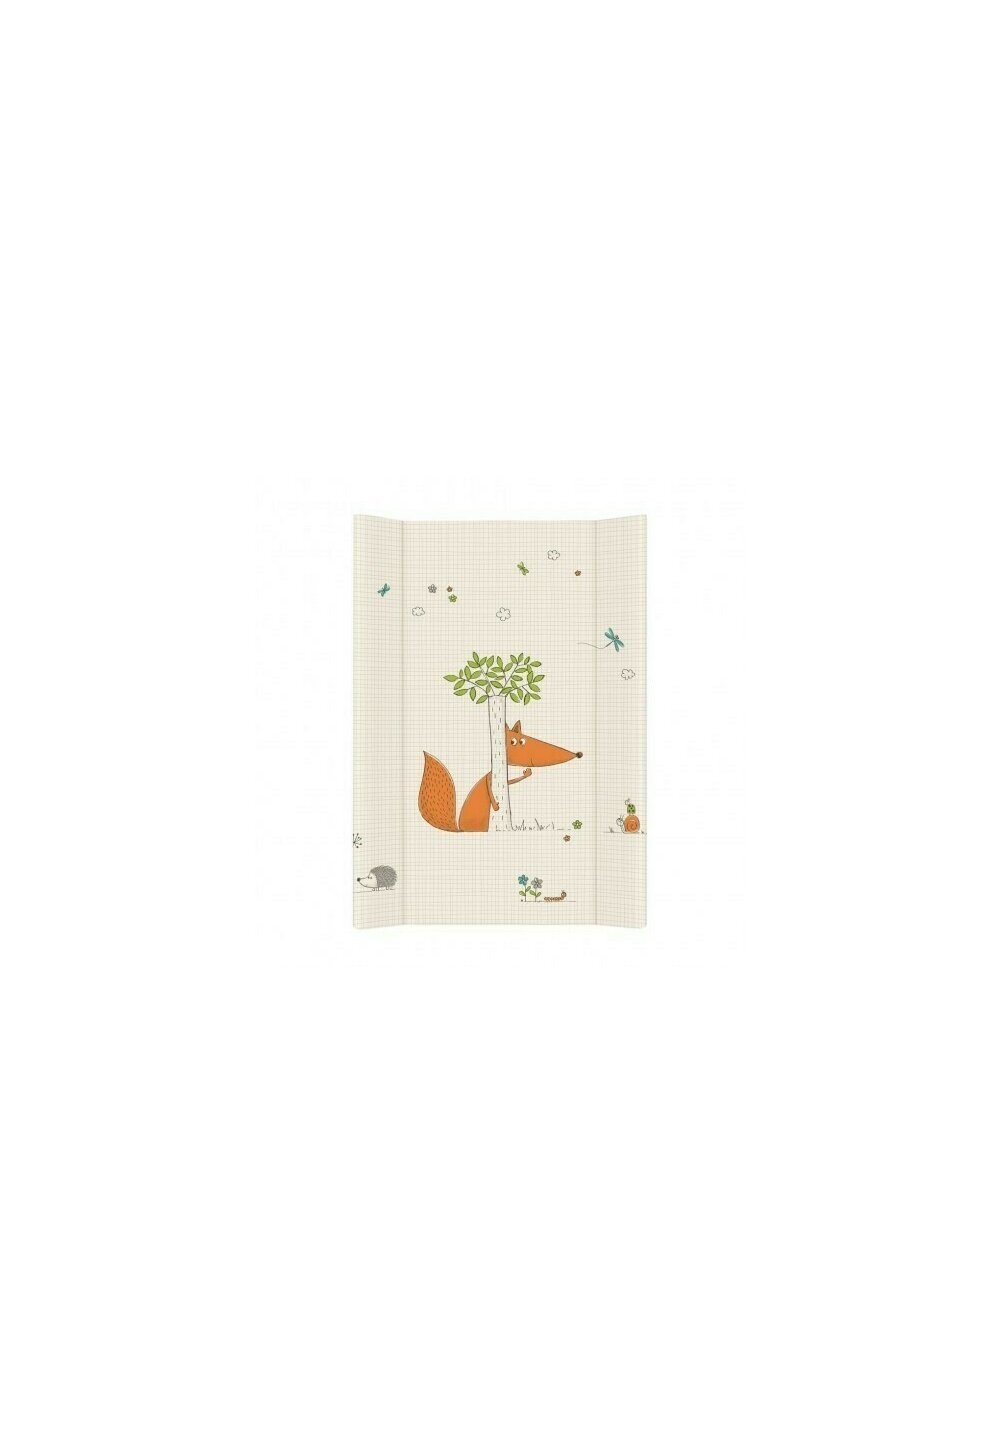 Saltea de infasat, vulpita, 50 X 80 cm imagine